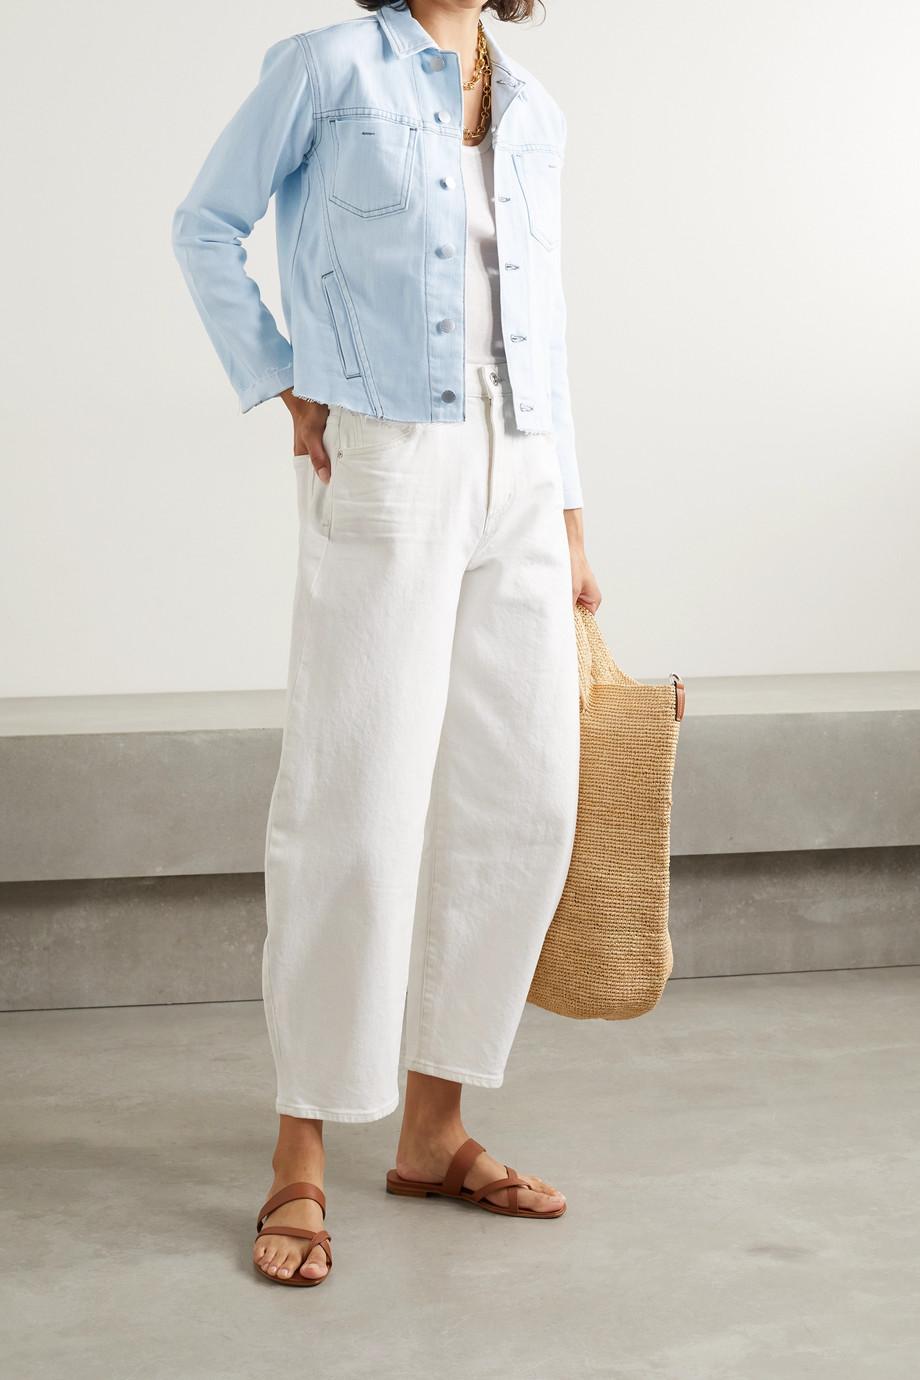 L'Agence Janelle cropped frayed stretch-denim jacket